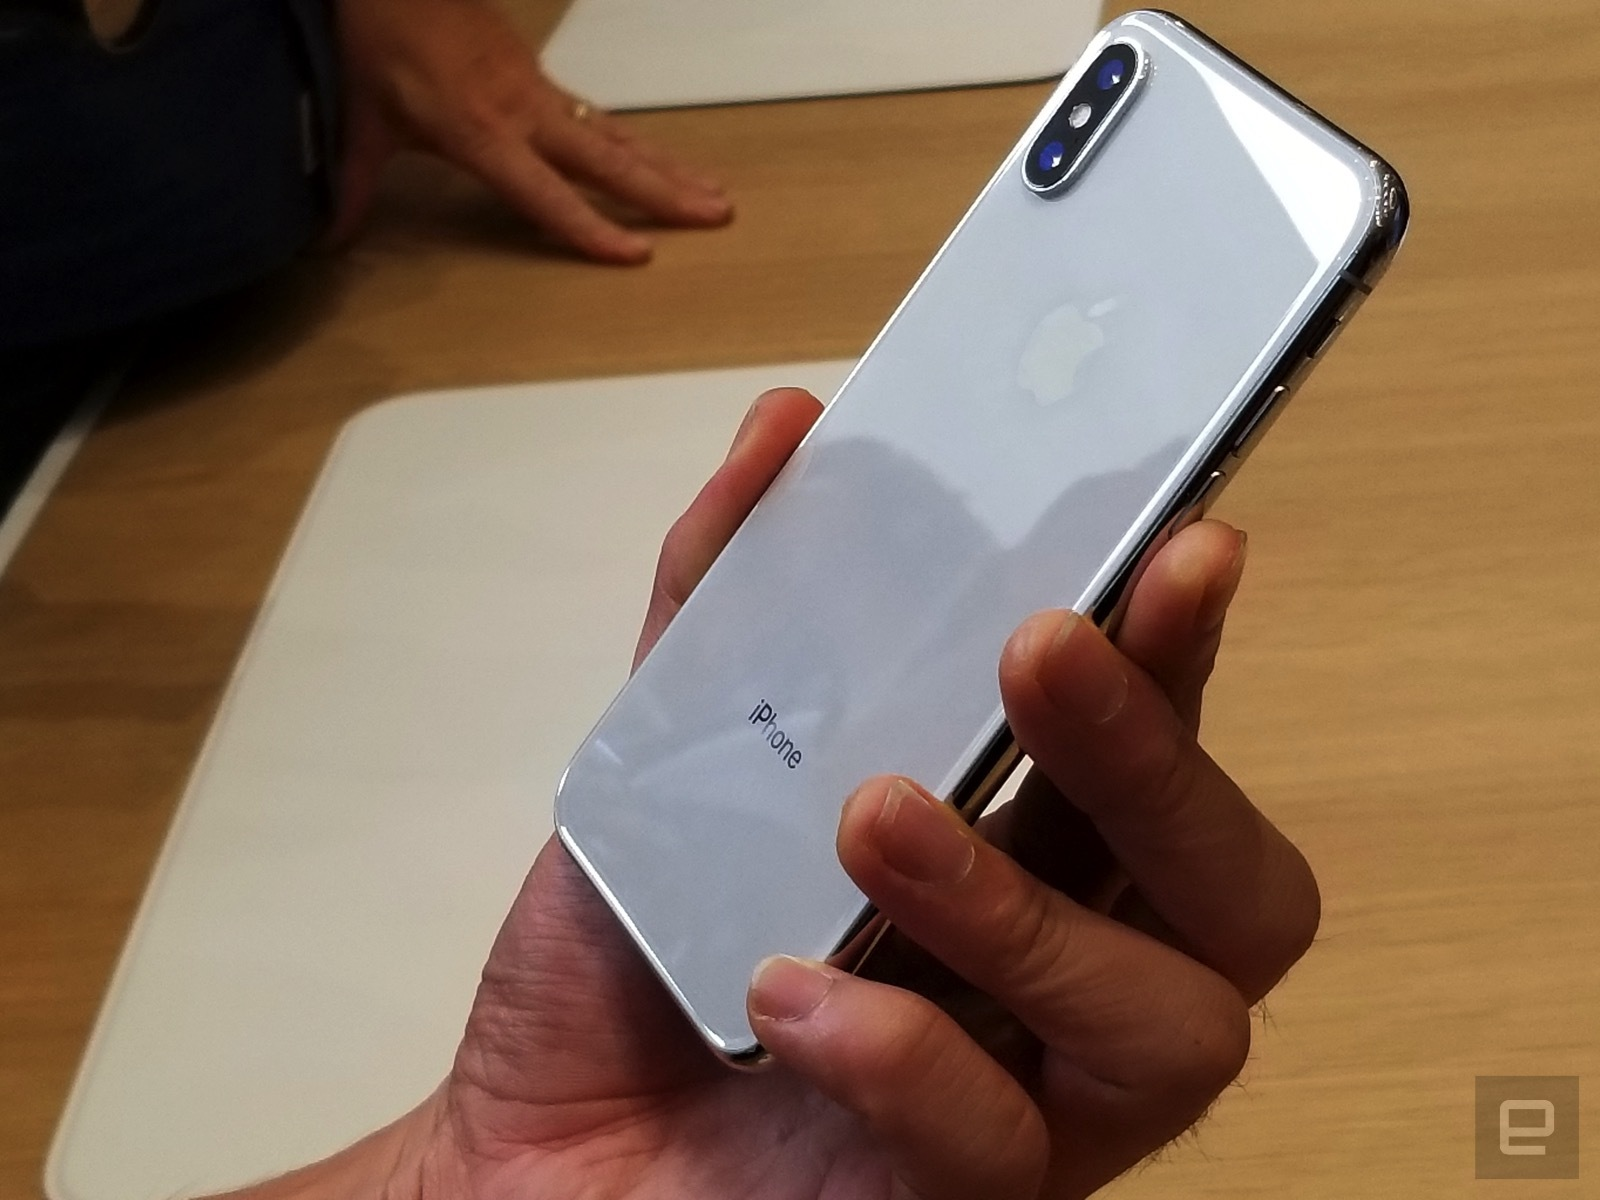 iphone-x-24hstore